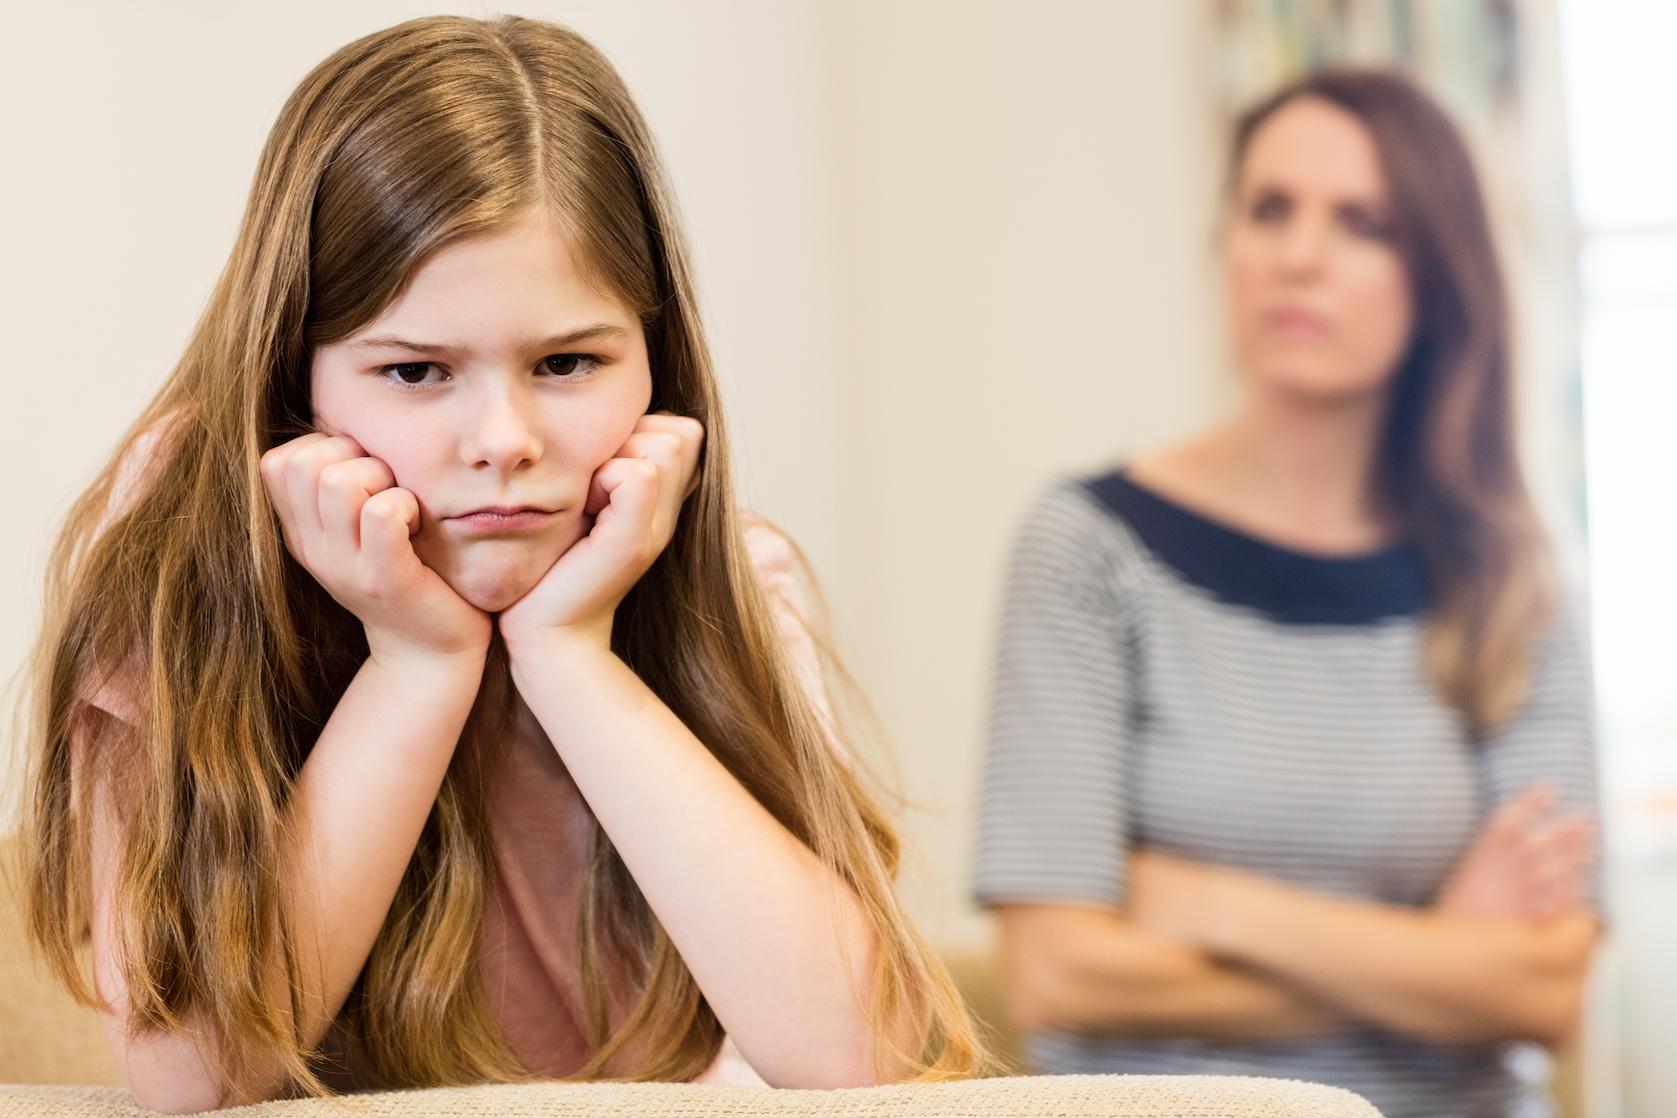 Ignoring Gut Instinct can Stem from Childhood